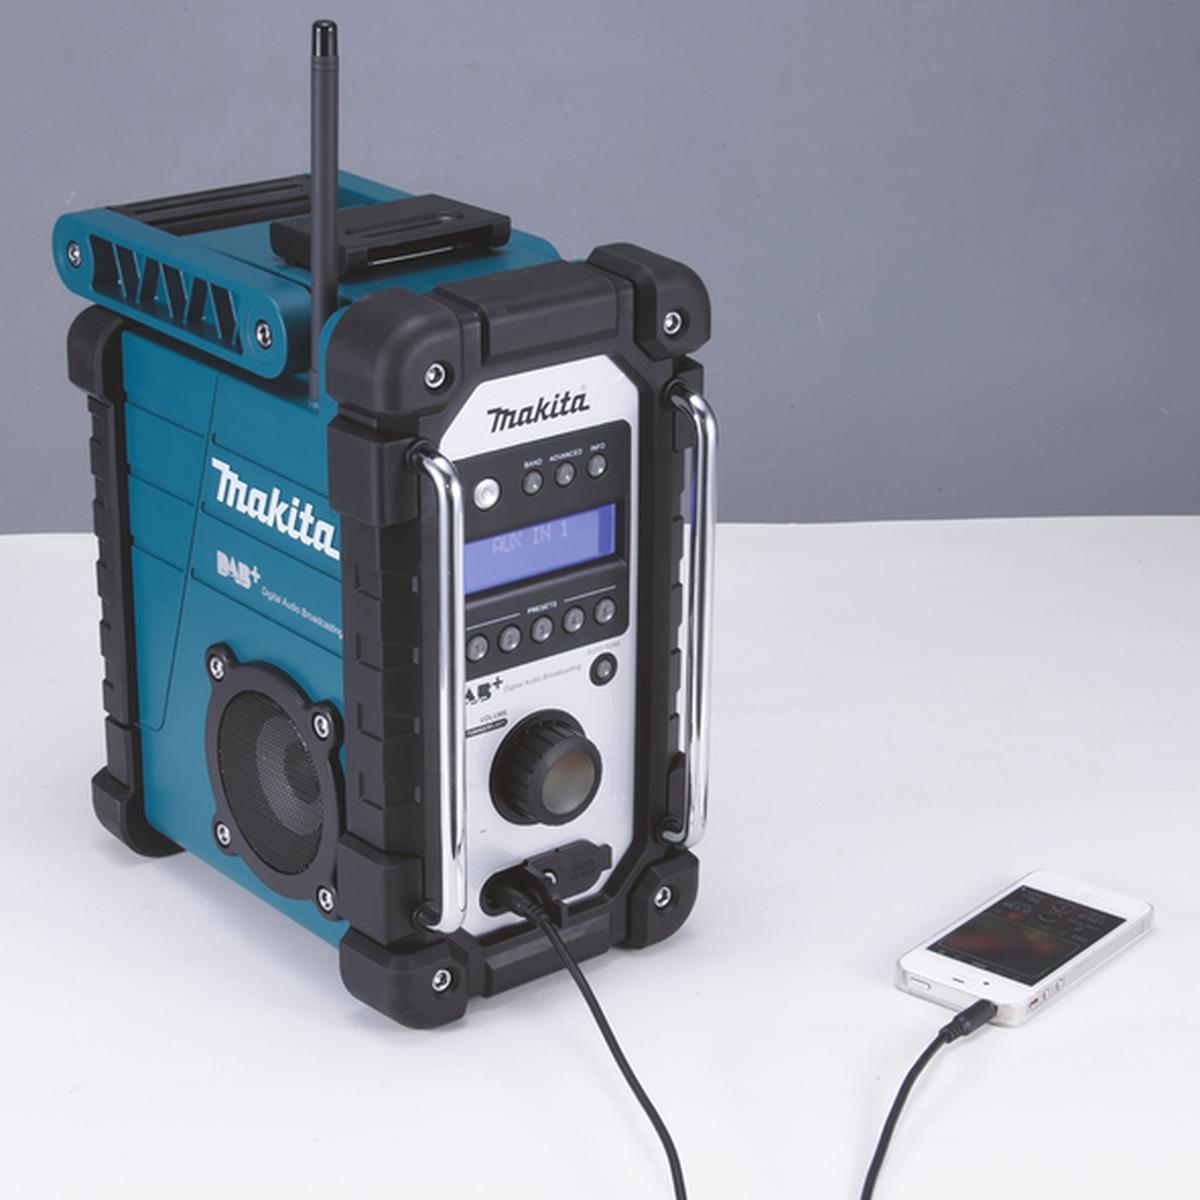 Makita radio dab+ DMR110